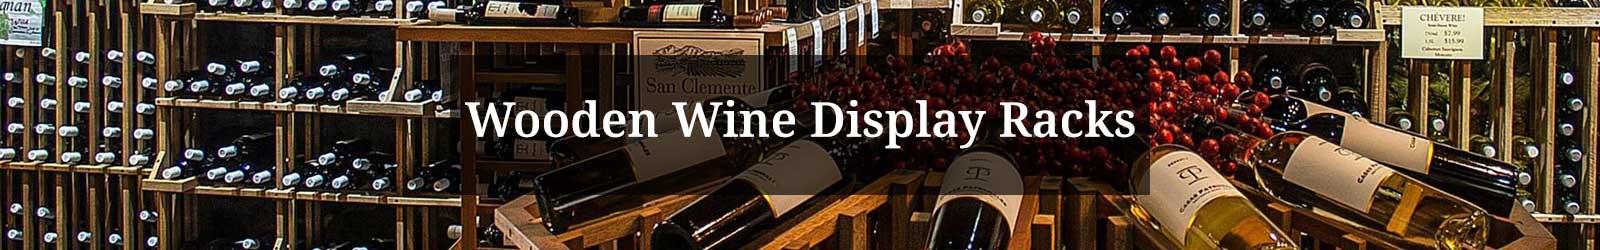 Wooden Wine Display Racks